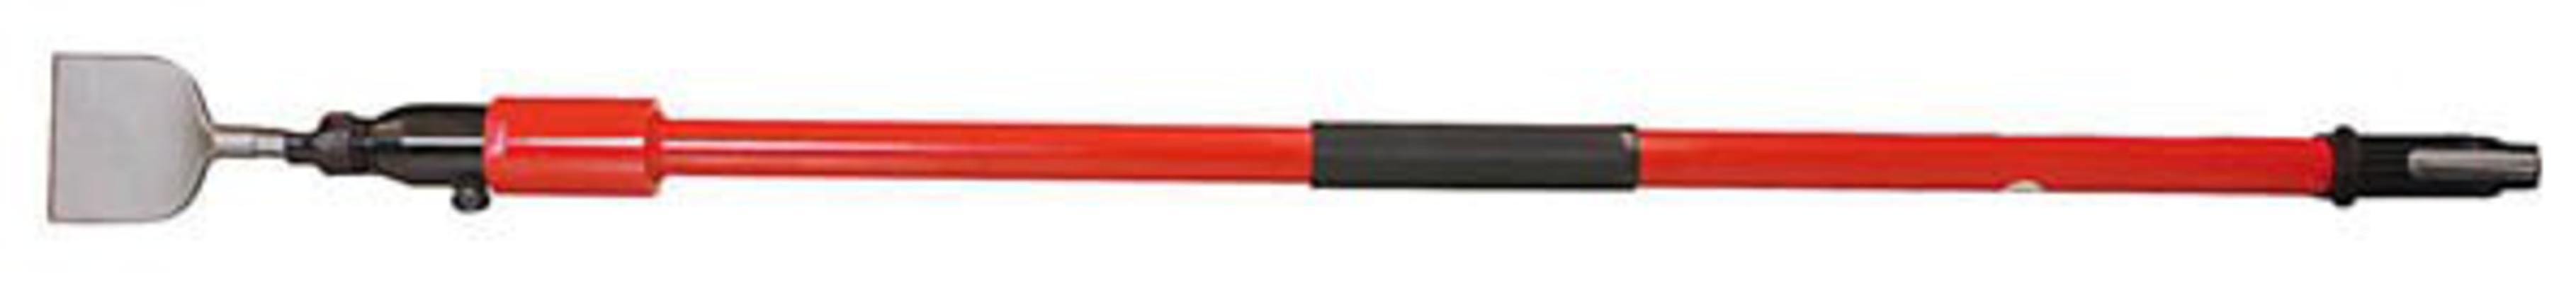 Petkele, 150 cm - Petkele, 150 cm